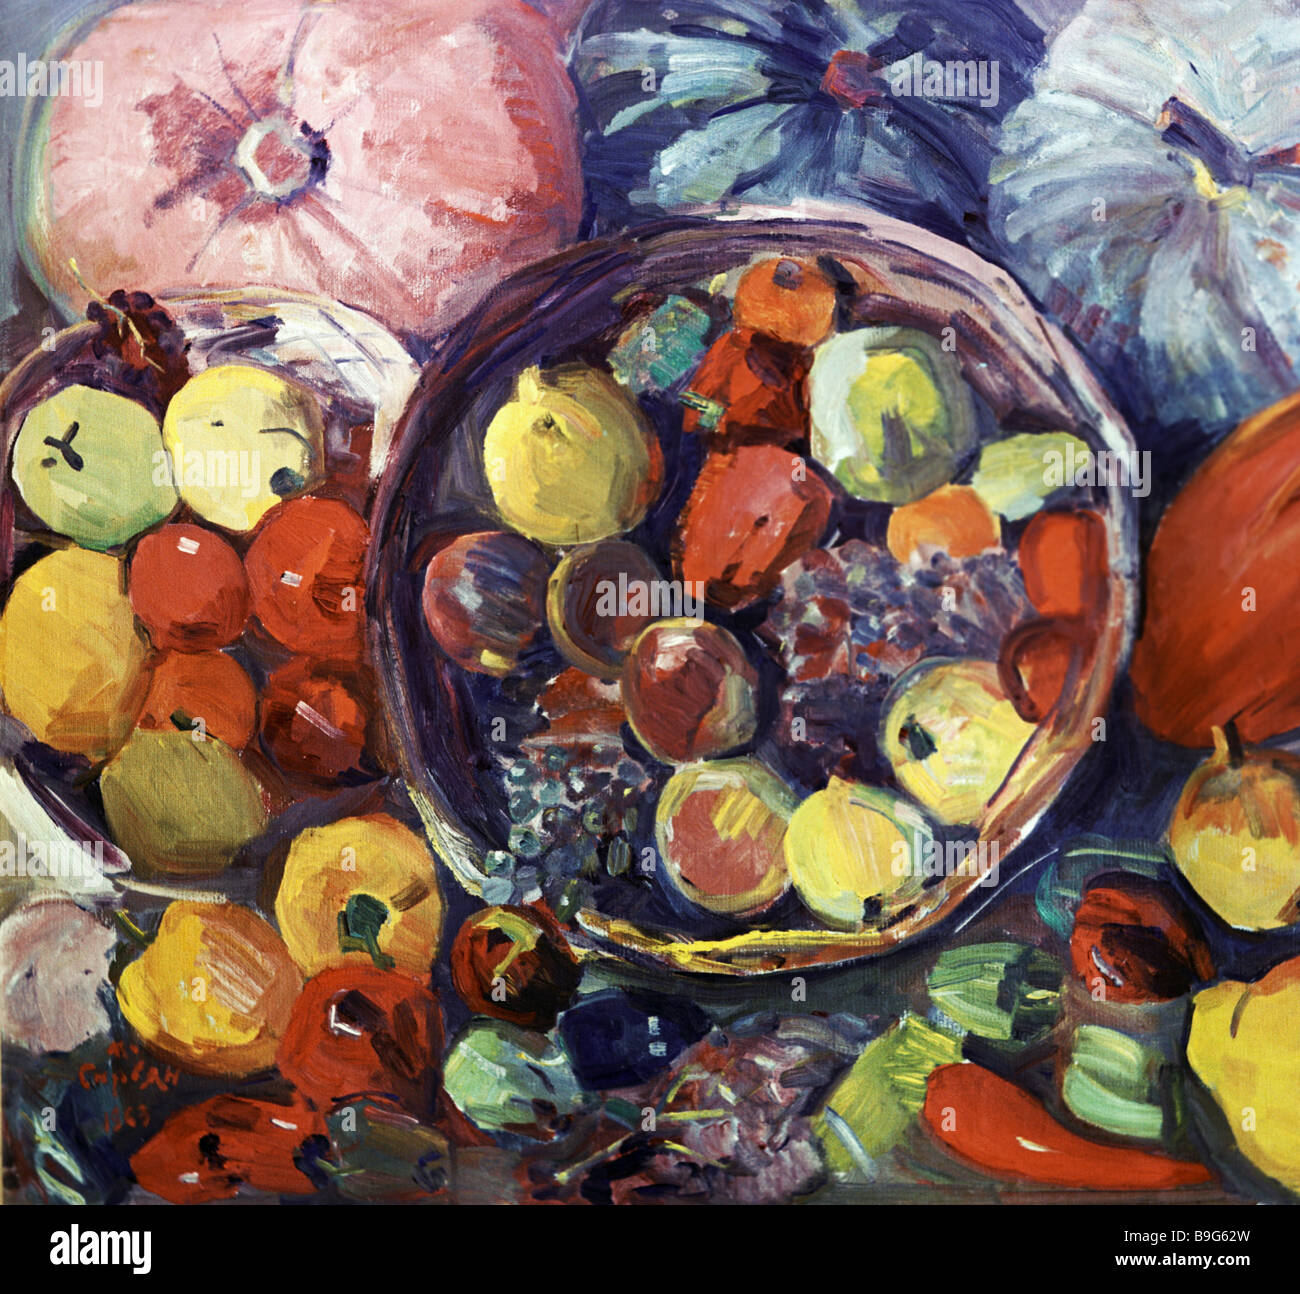 Riproduzione di Martiros Saryan s verniciatura autunno ancora in vita dal Martiros Saryan museum di Yerevan Immagini Stock